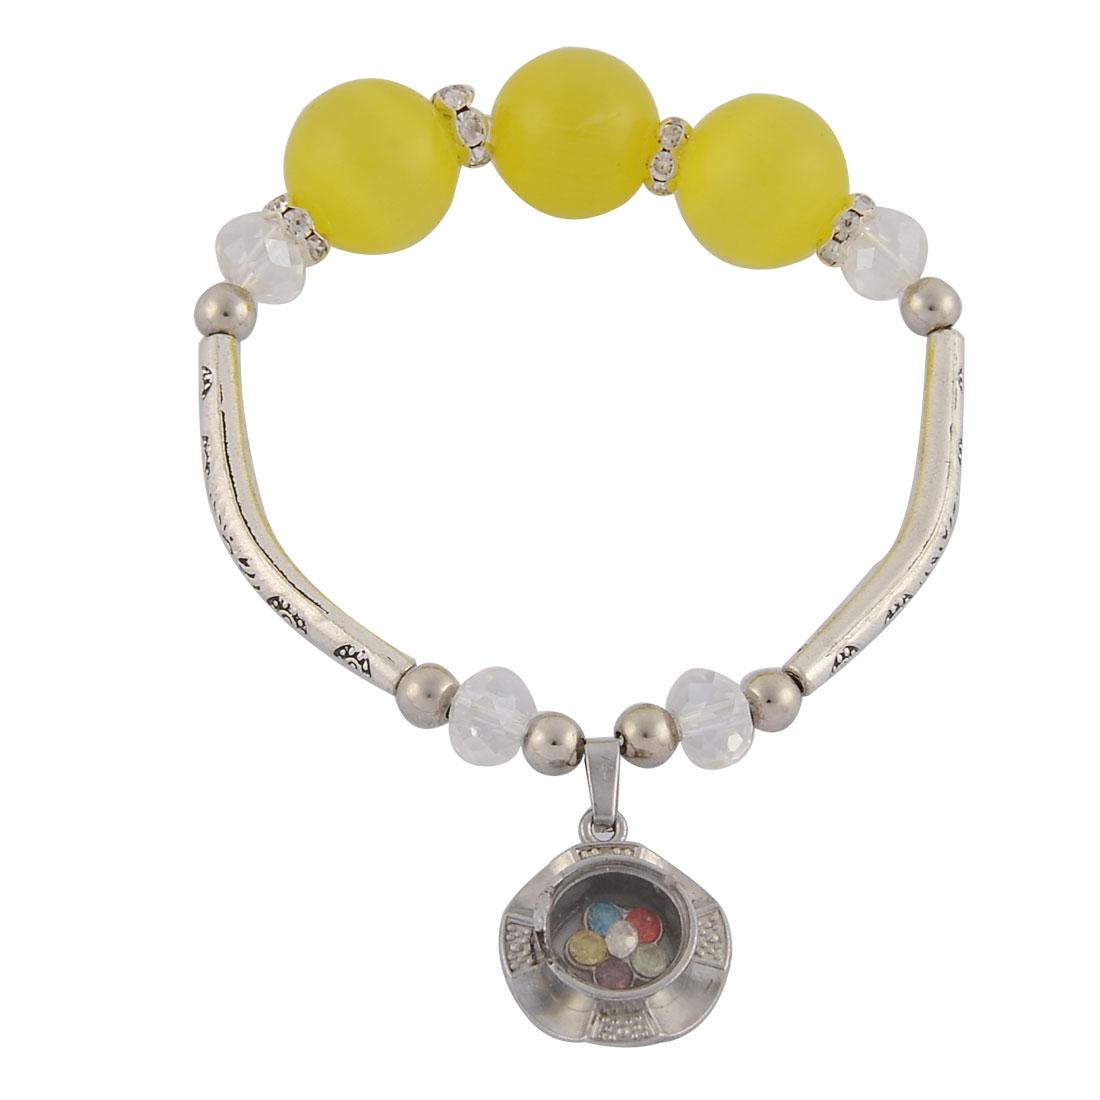 Women Rhinestone Inlaid Pendant Elastic Bead Chain Wrist Bracelet Bangle Light Yellow